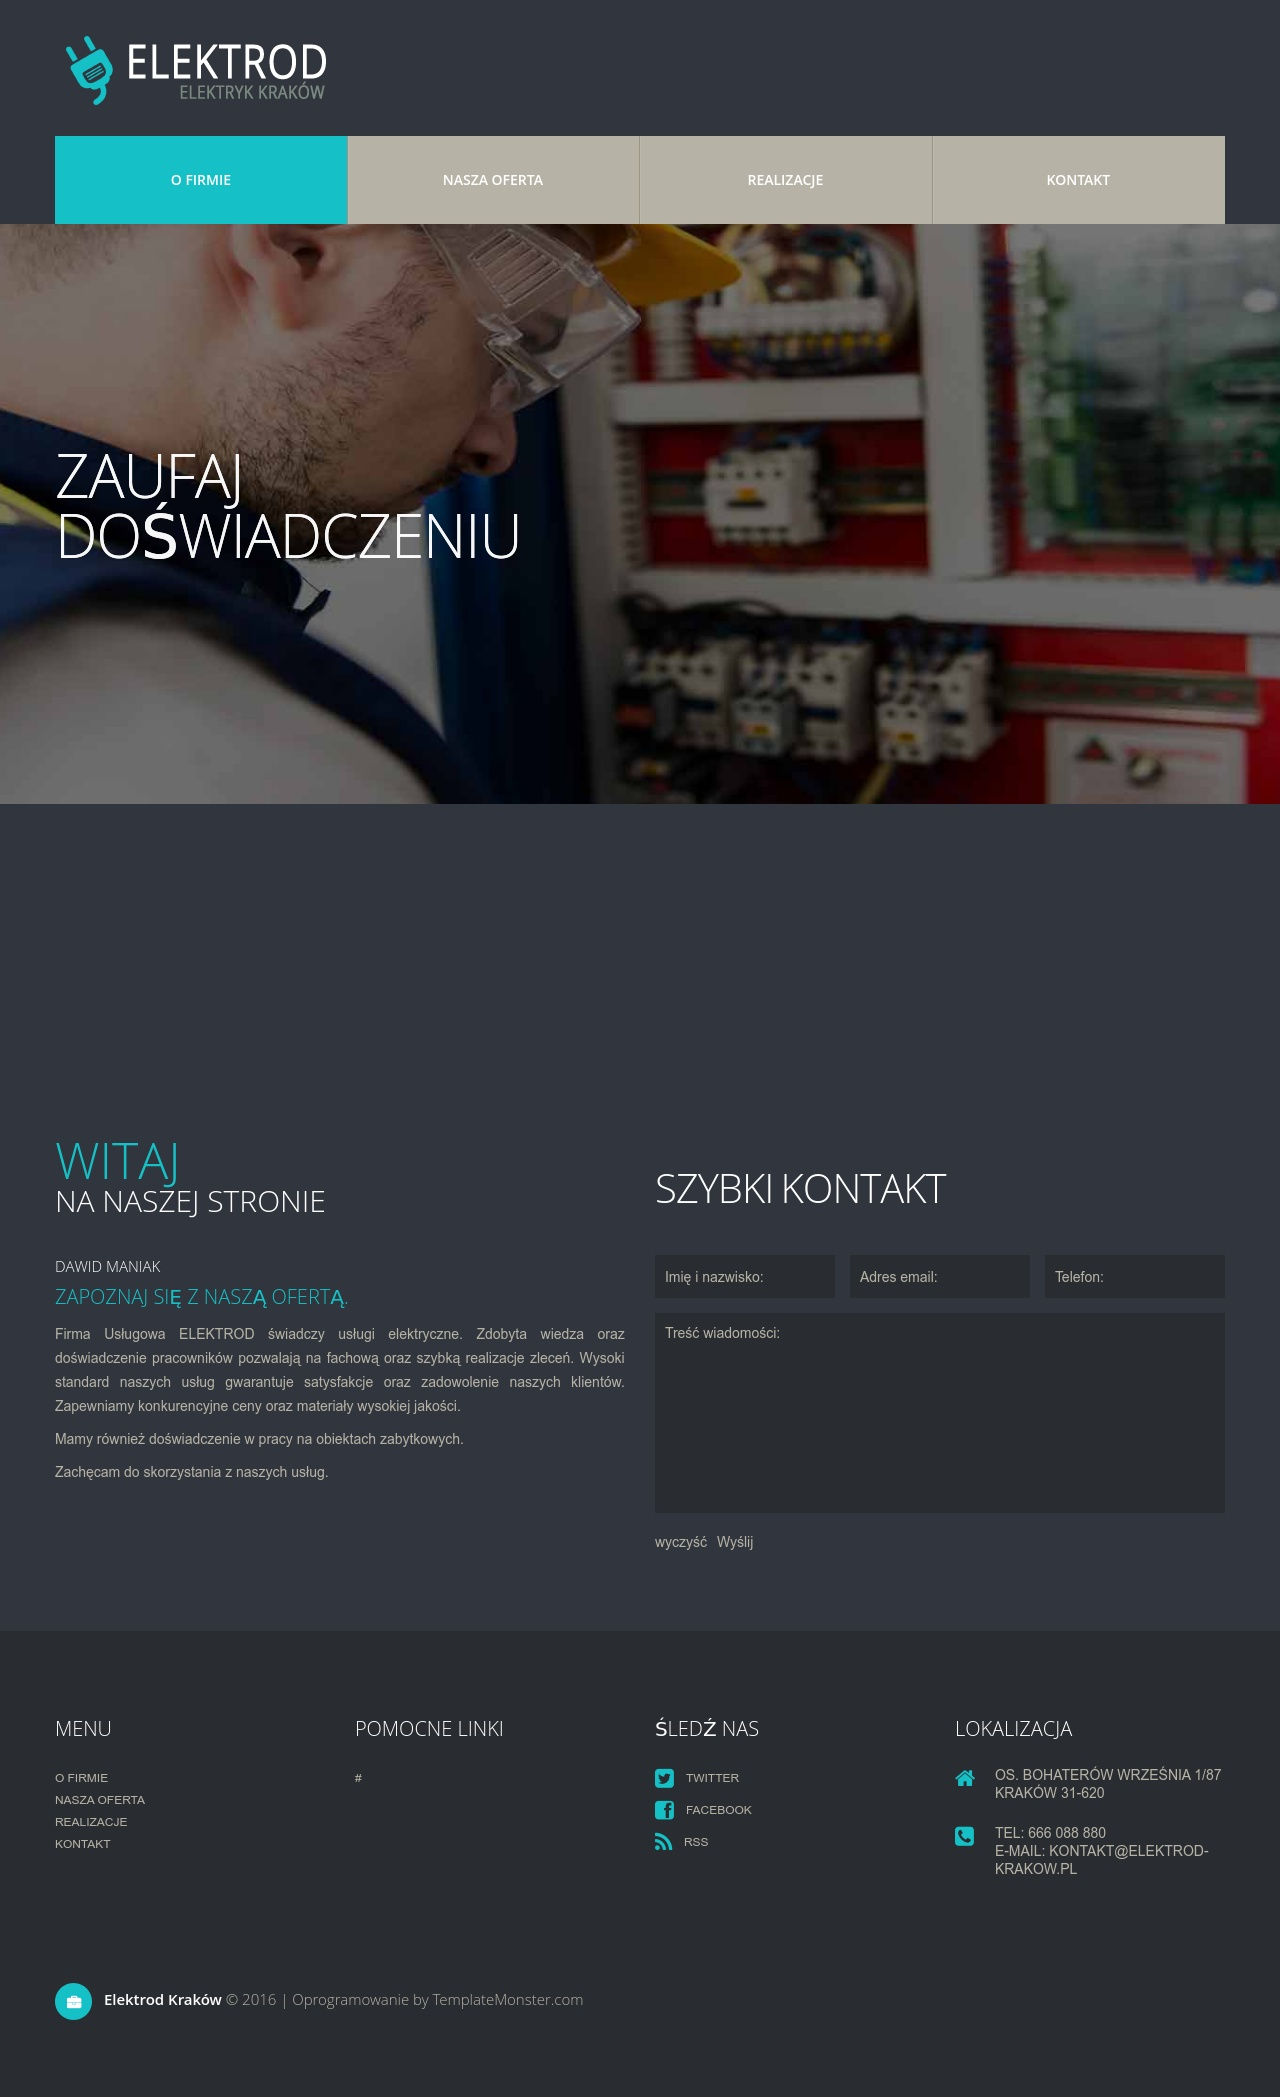 Elektrod-krakow.pl